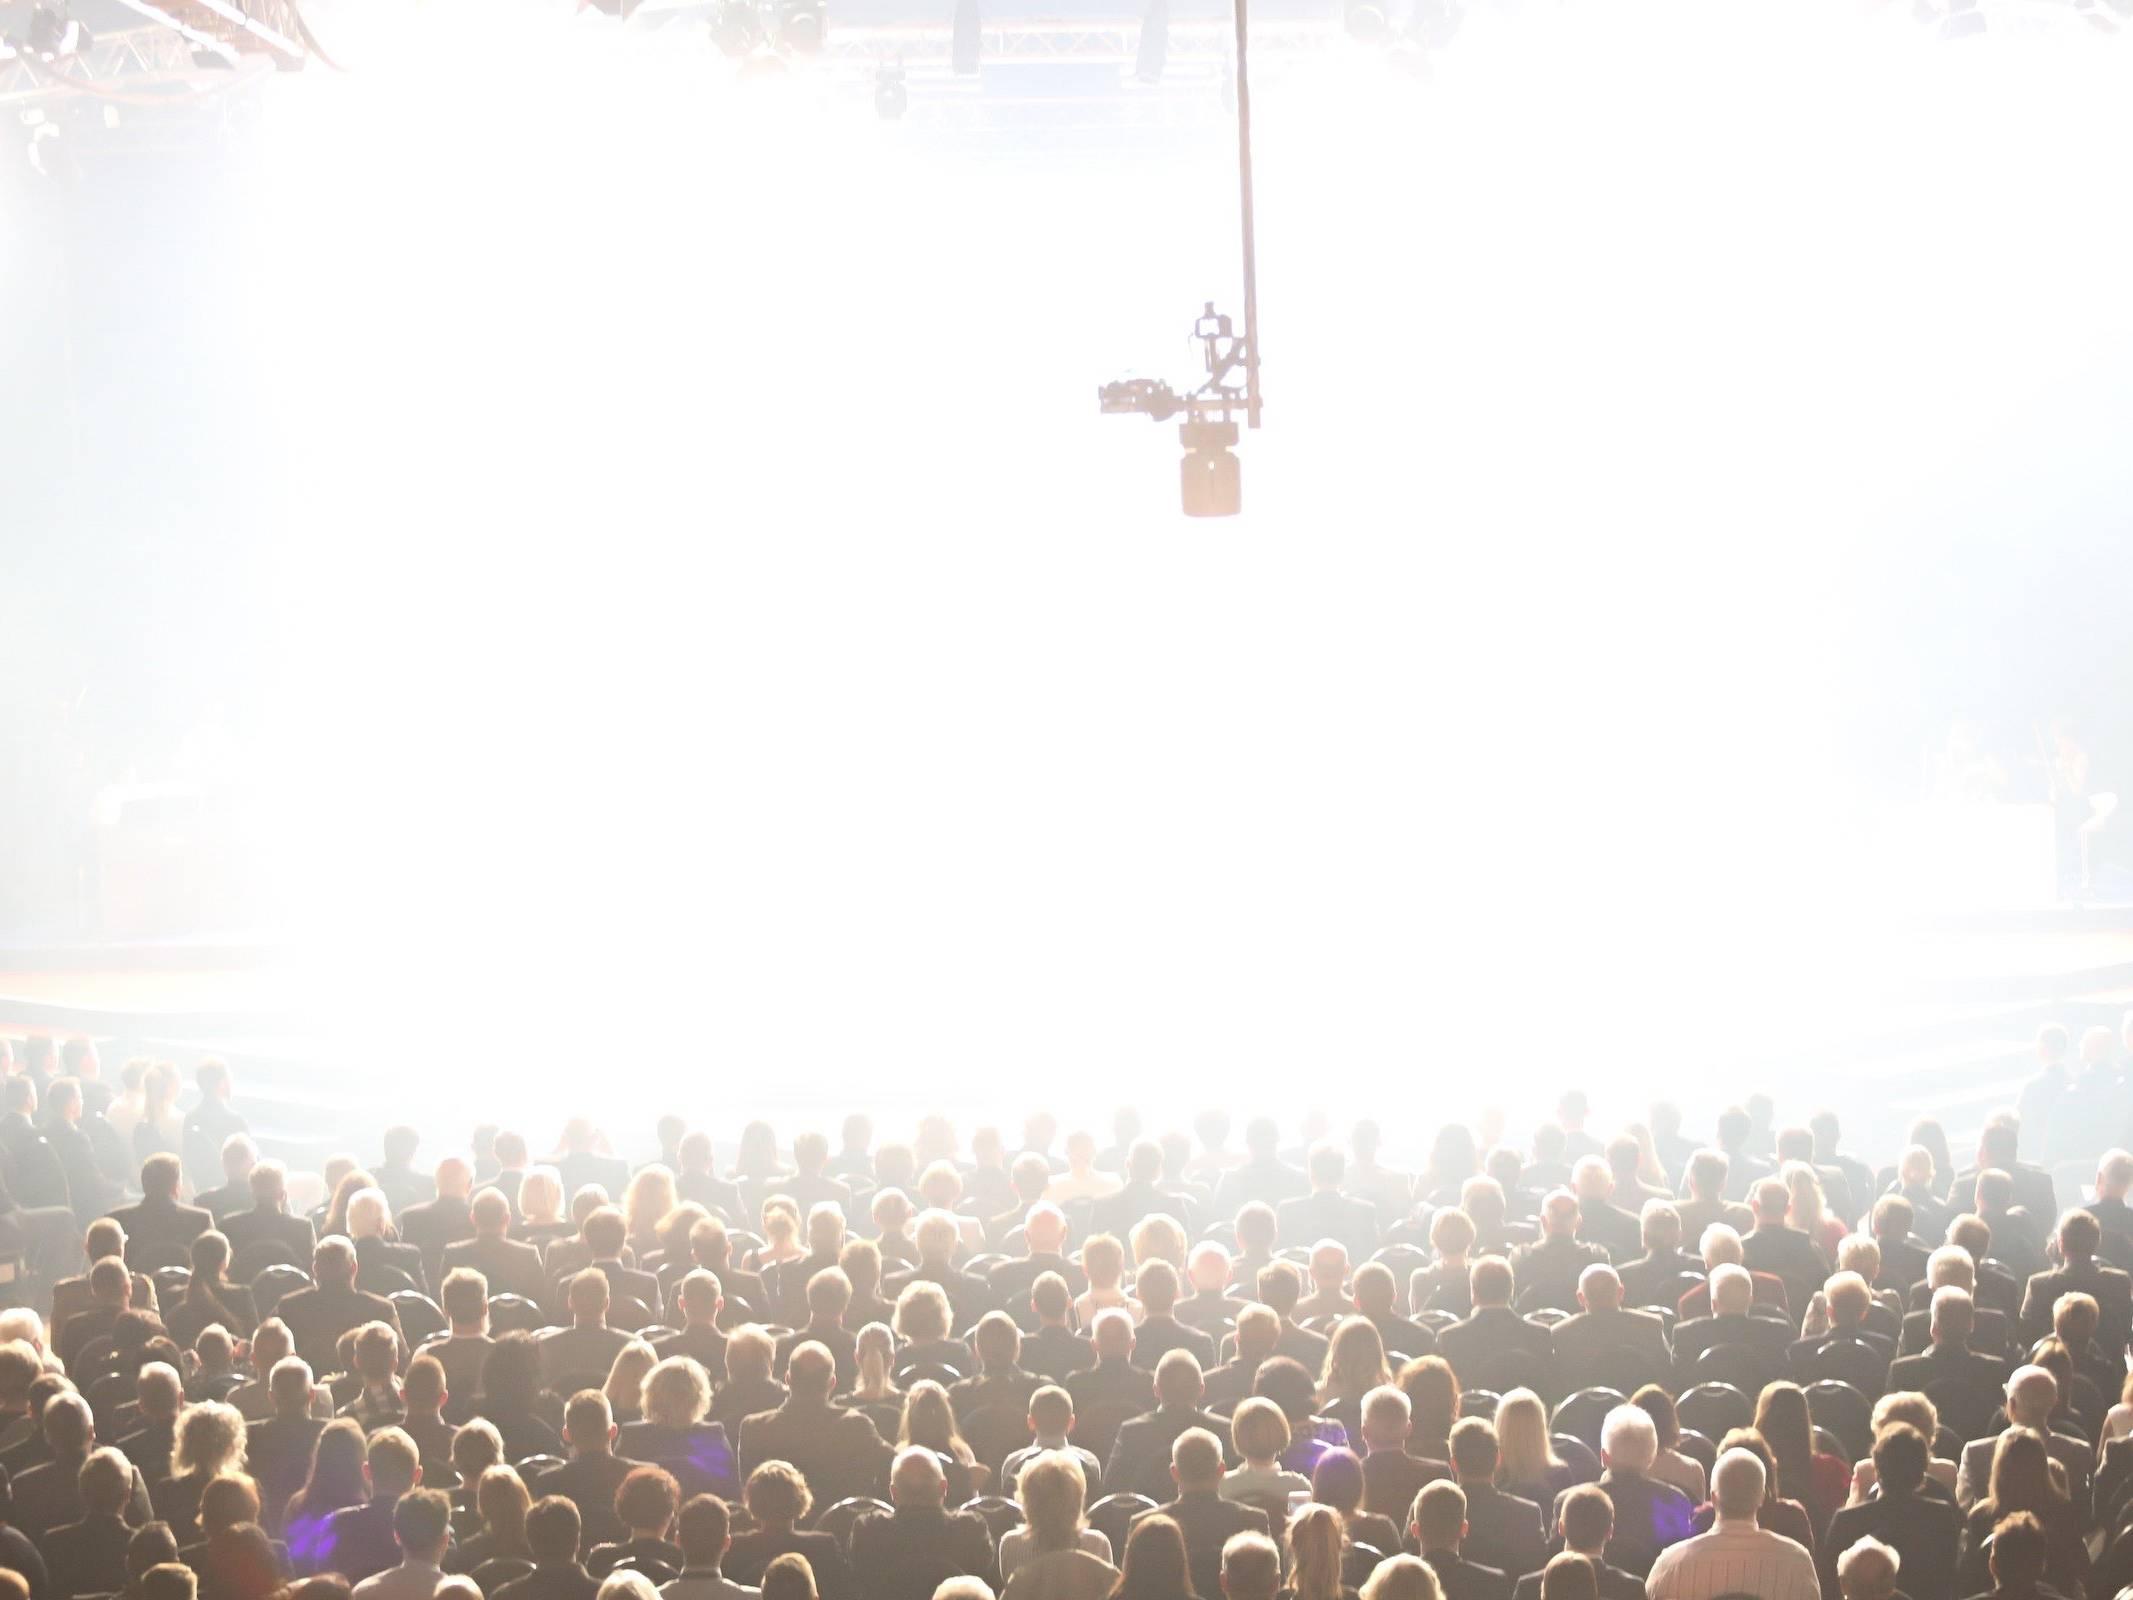 Band | Hamburg | Liveband | Livemusik | Walking | Act | Partyband | Jazzband | Swingband | Loungeband | Popband | Jazz | Saxophonist | Bühnenshow | Konzert | Hochzeit | Messe | Firmenfeier | Charity | Gala | Anfragen | Hamburgfeiert